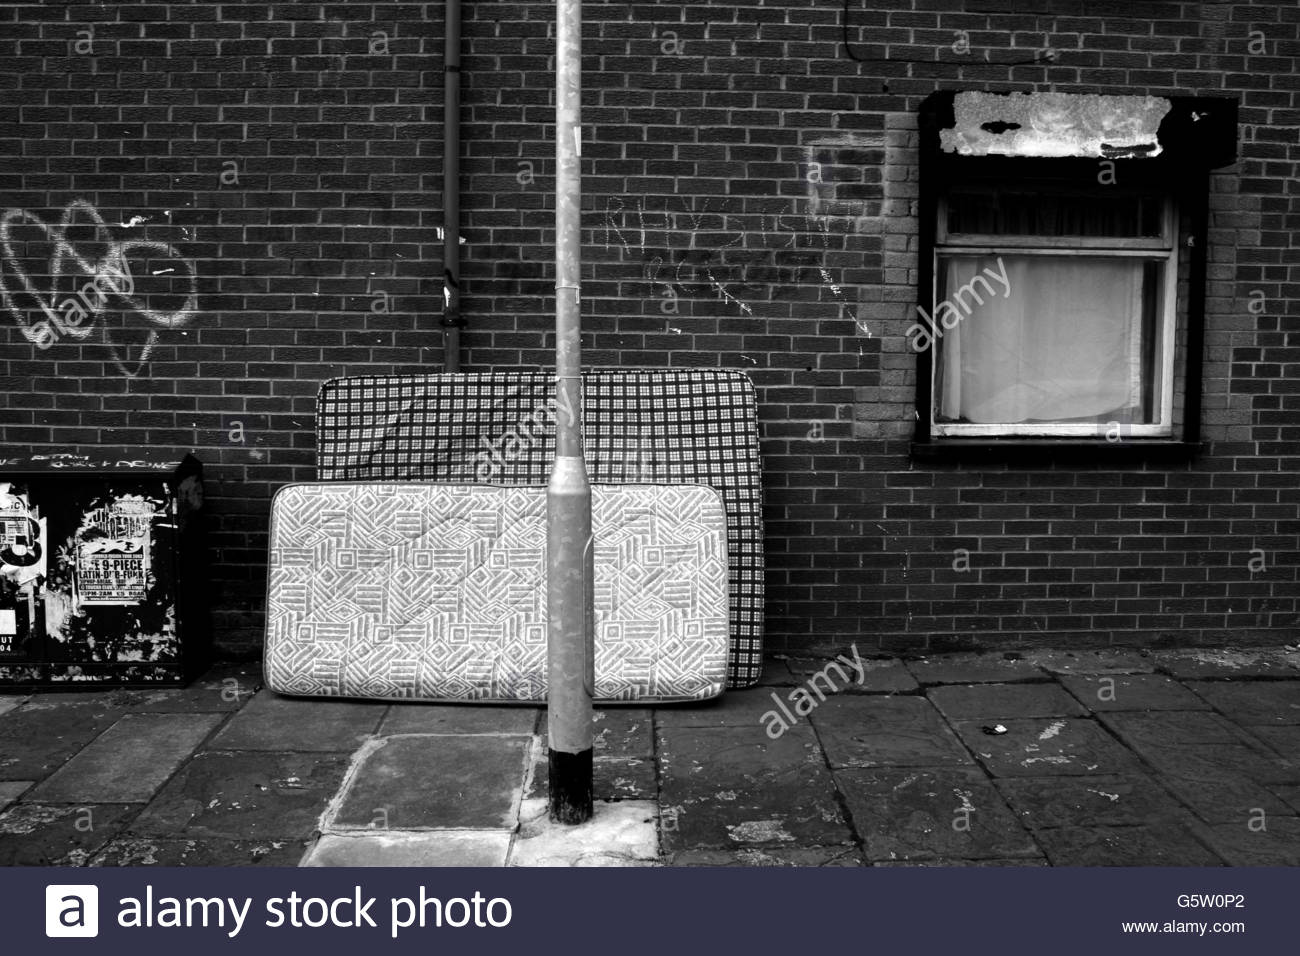 Dumped Mattresses - Stock Image